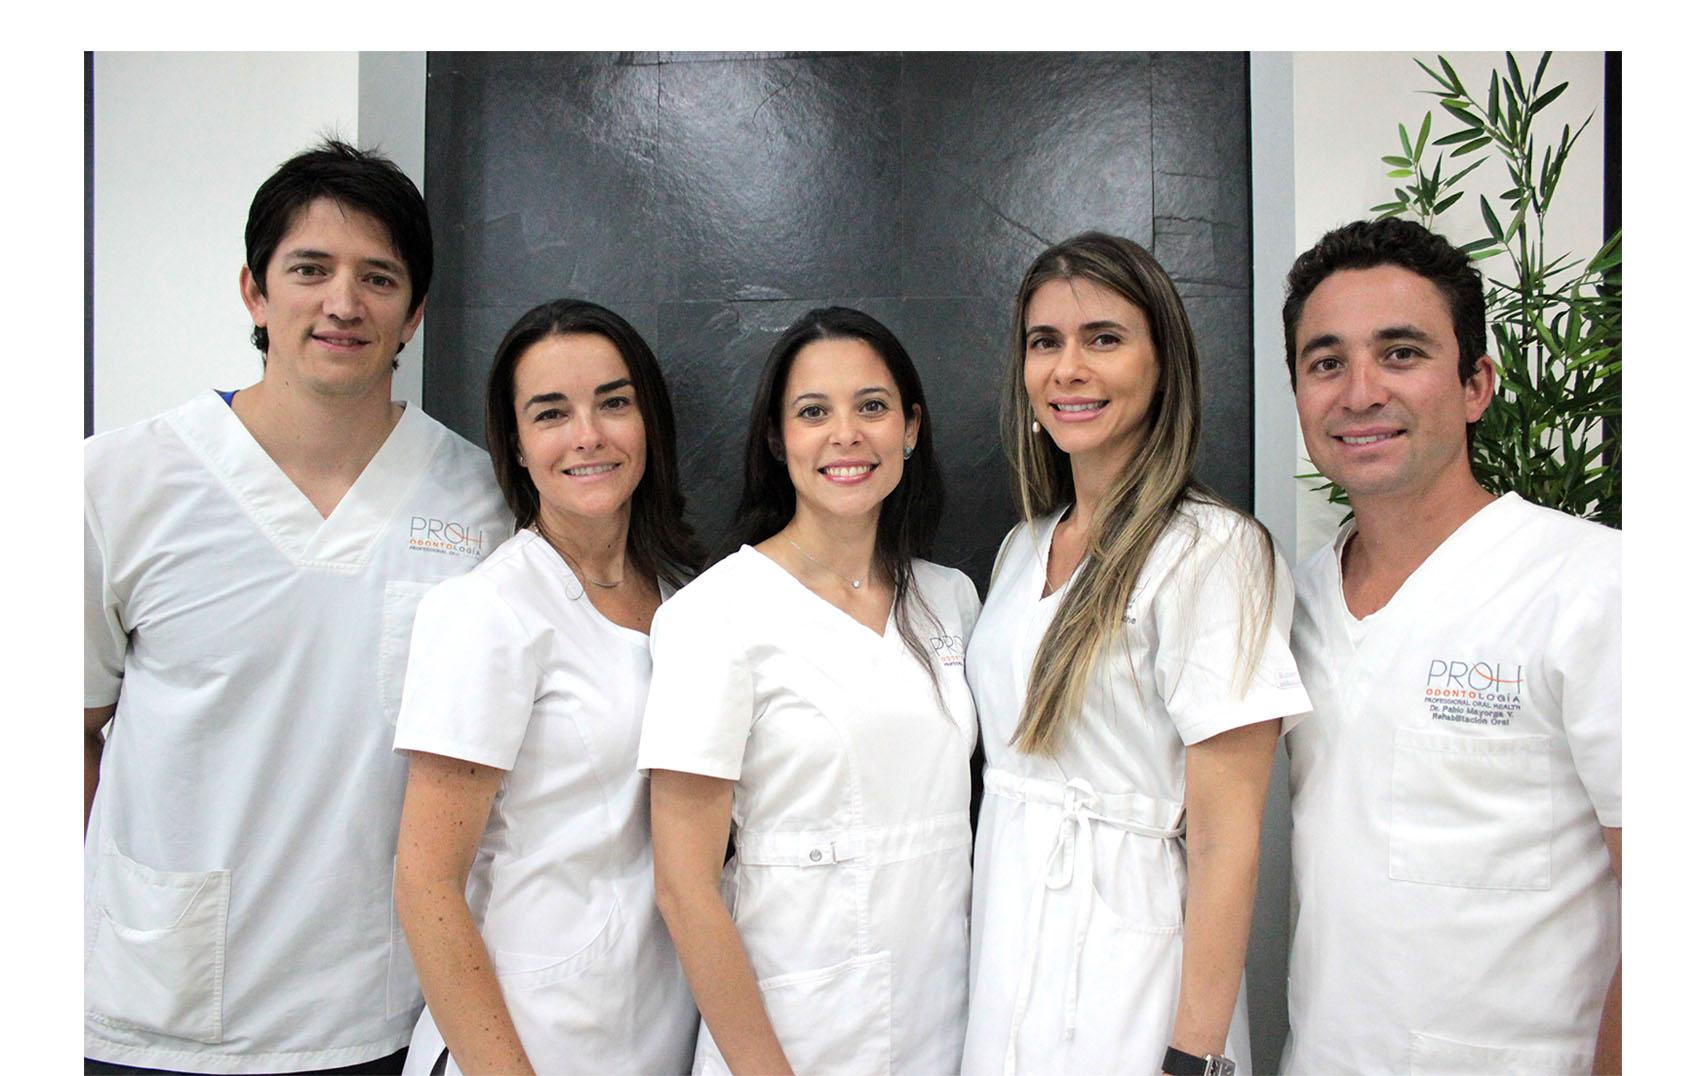 Professional Oral Health